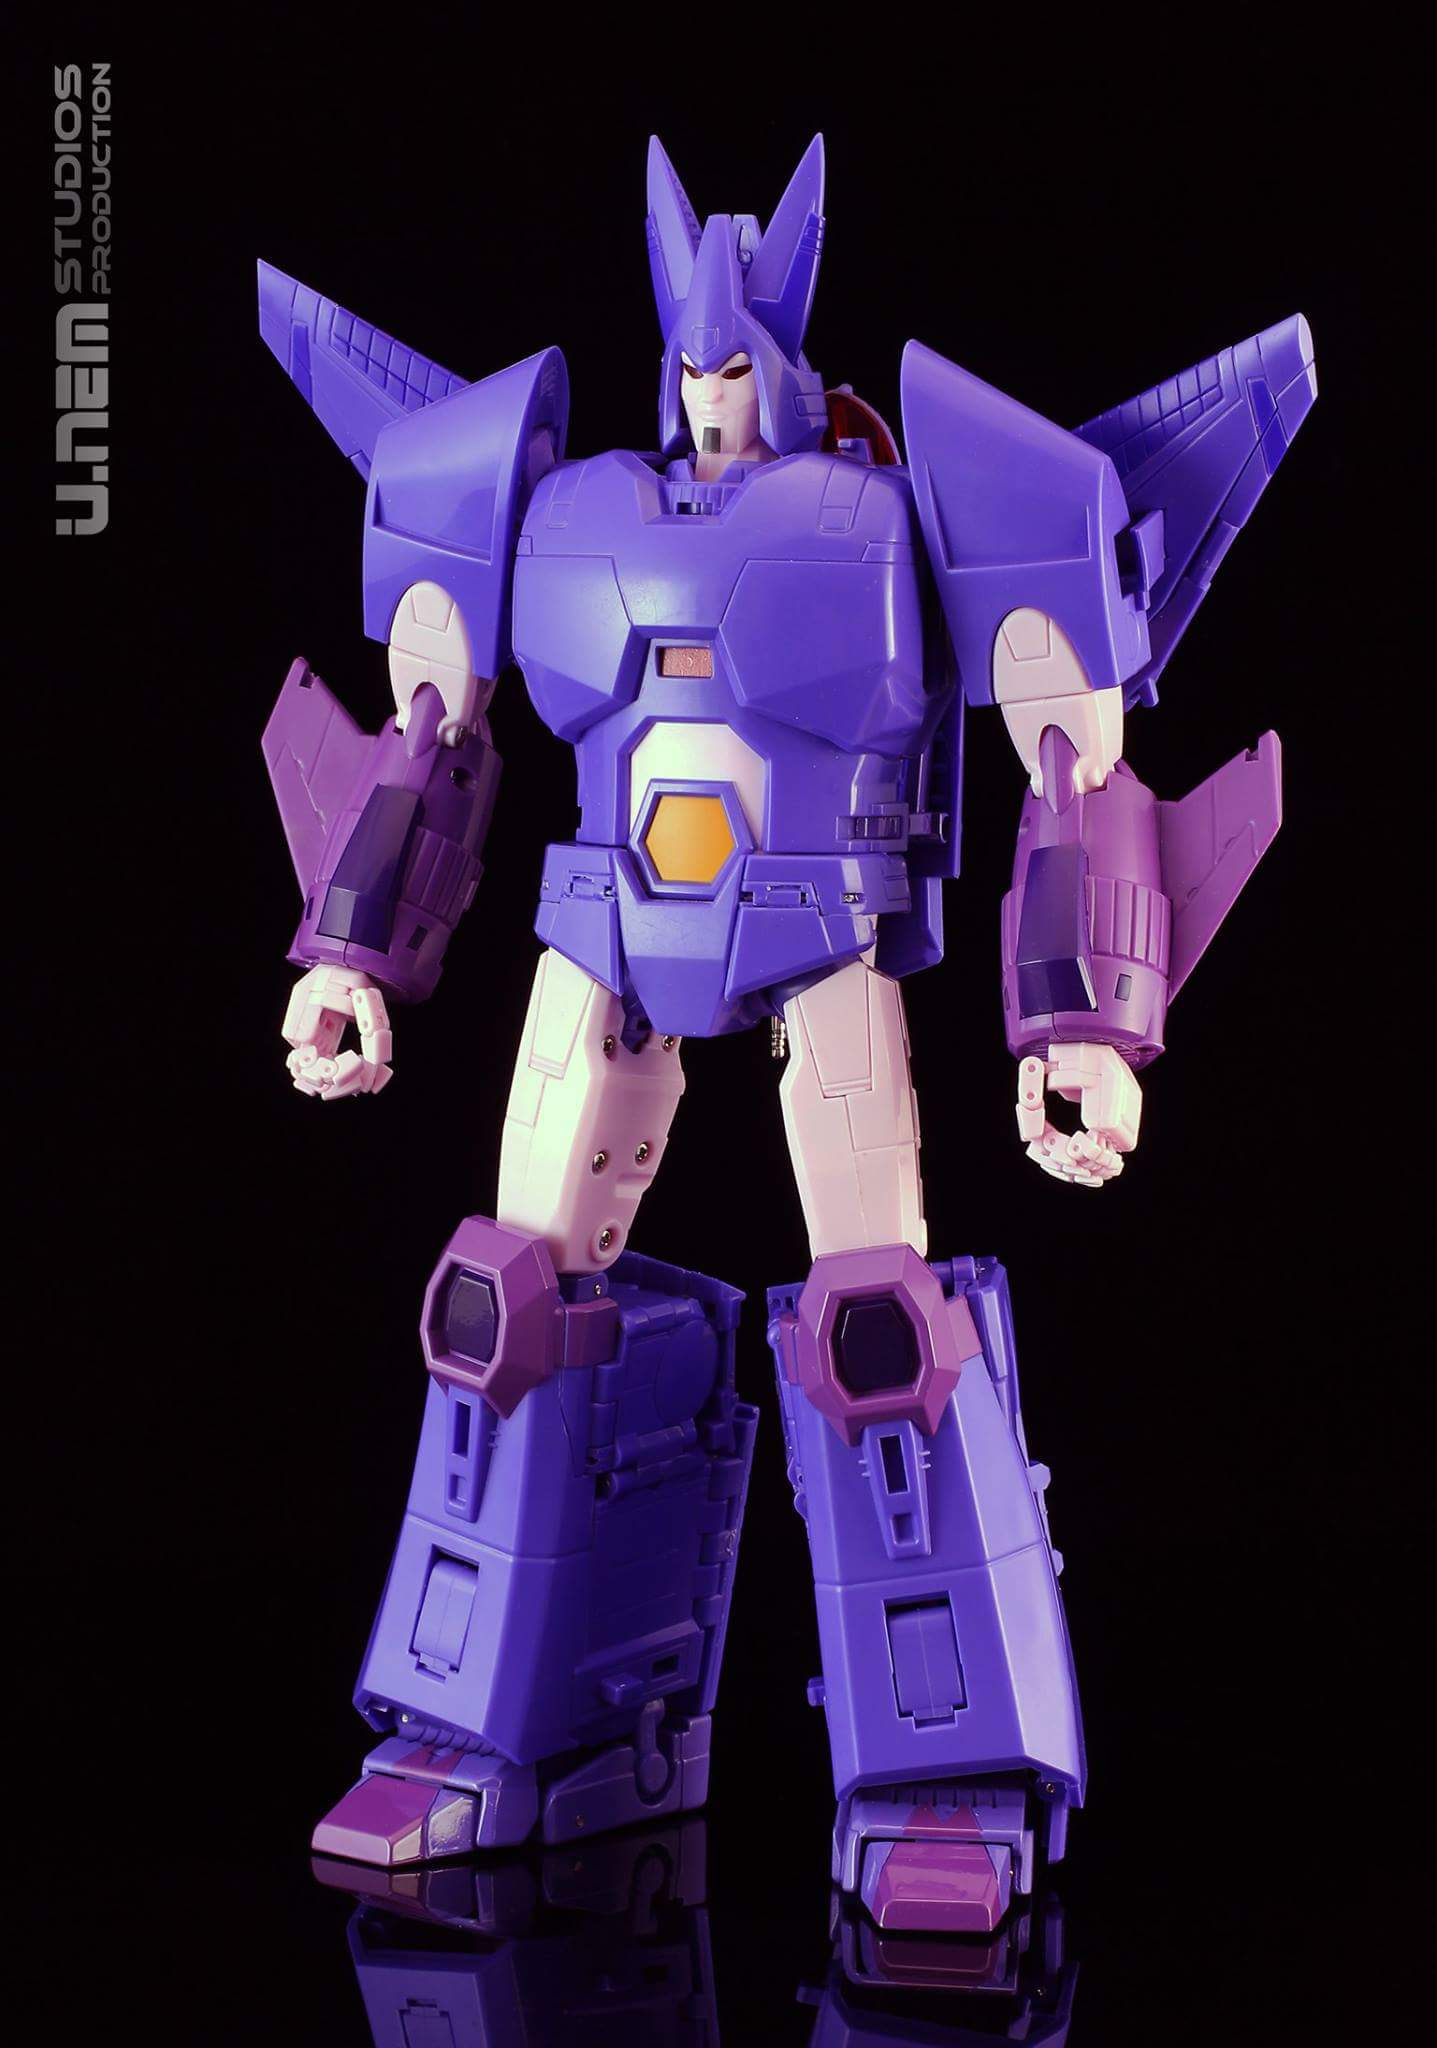 [X-Transbots] Produit Tiers - MX-III Eligos - aka Cyclonus - Page 3 VaNrQpRY